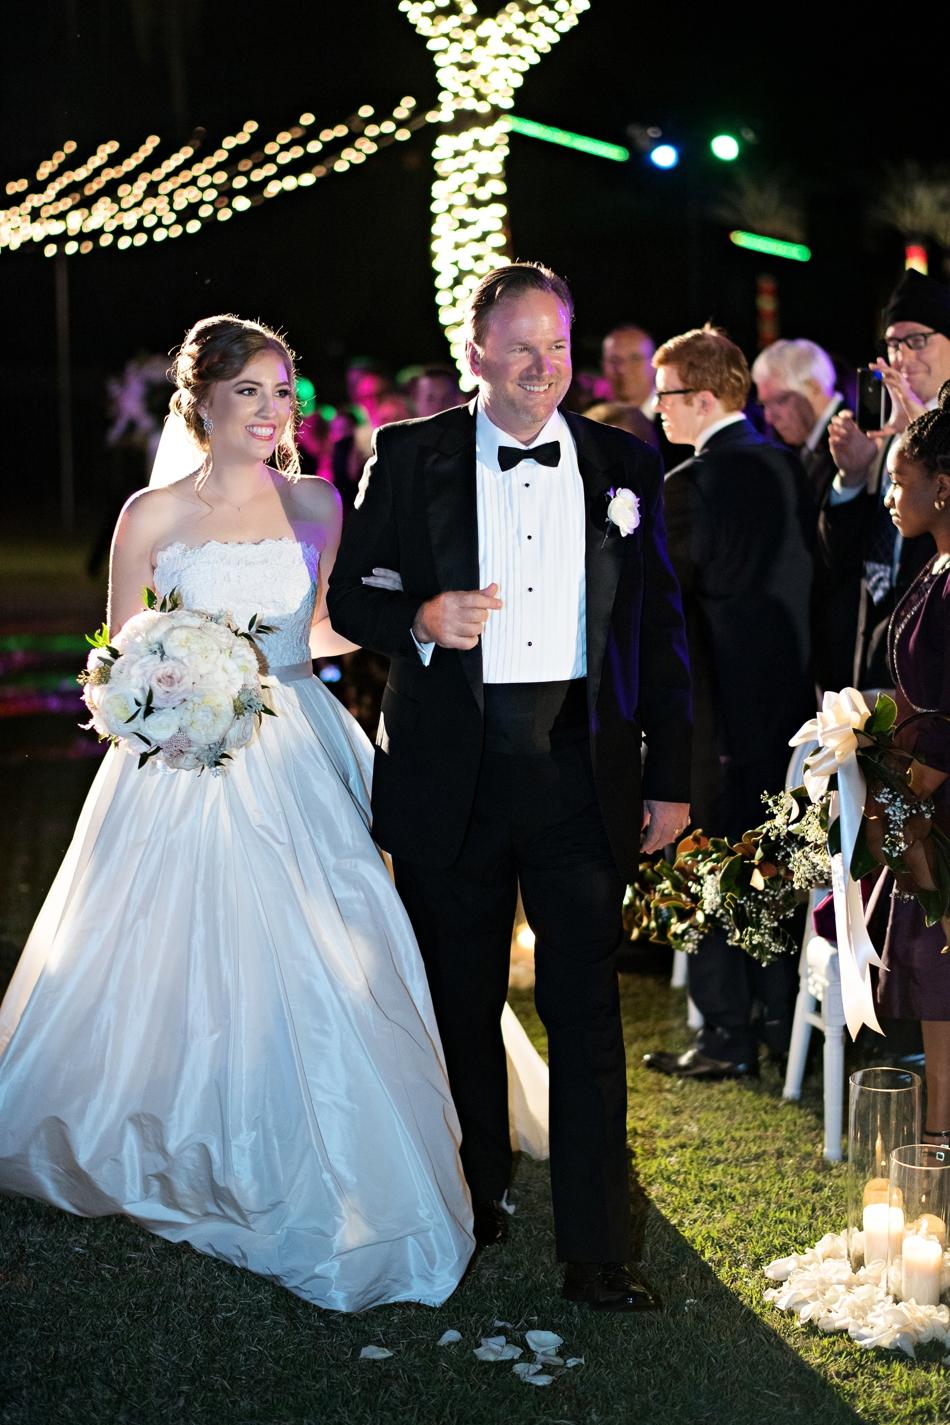 night wedding ceremony